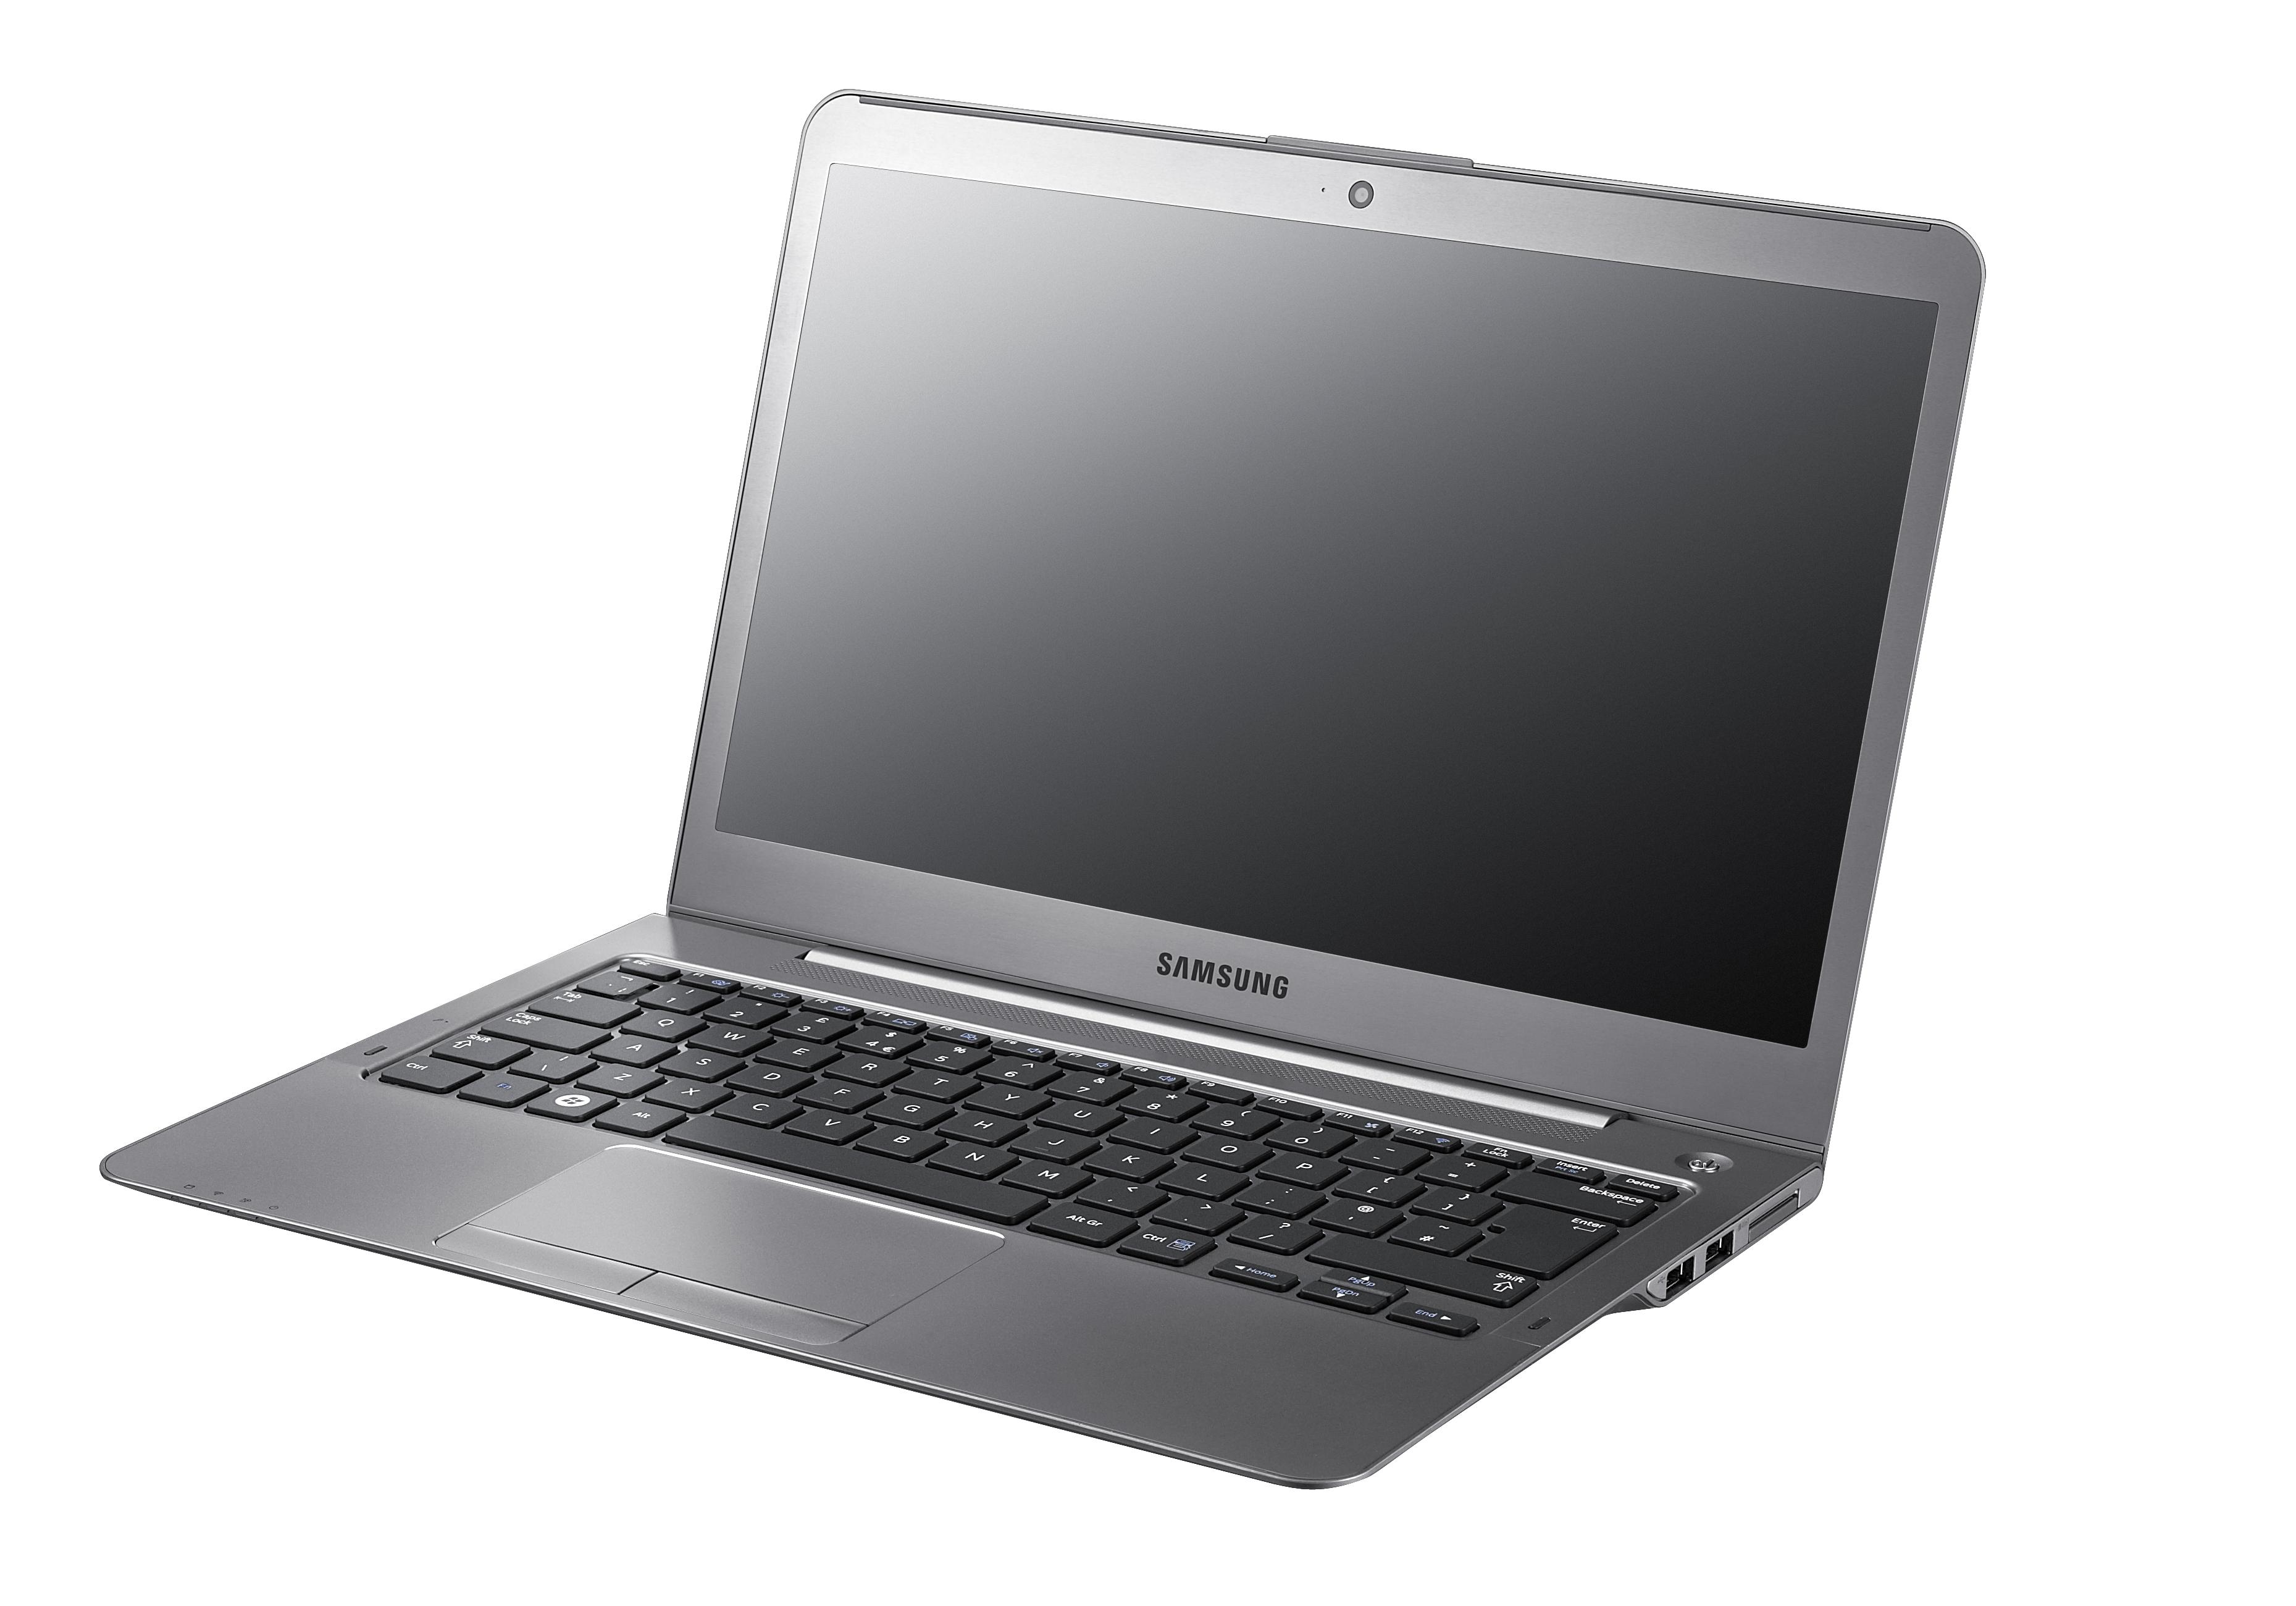 CES: Samsung ma swoje ultrabooki